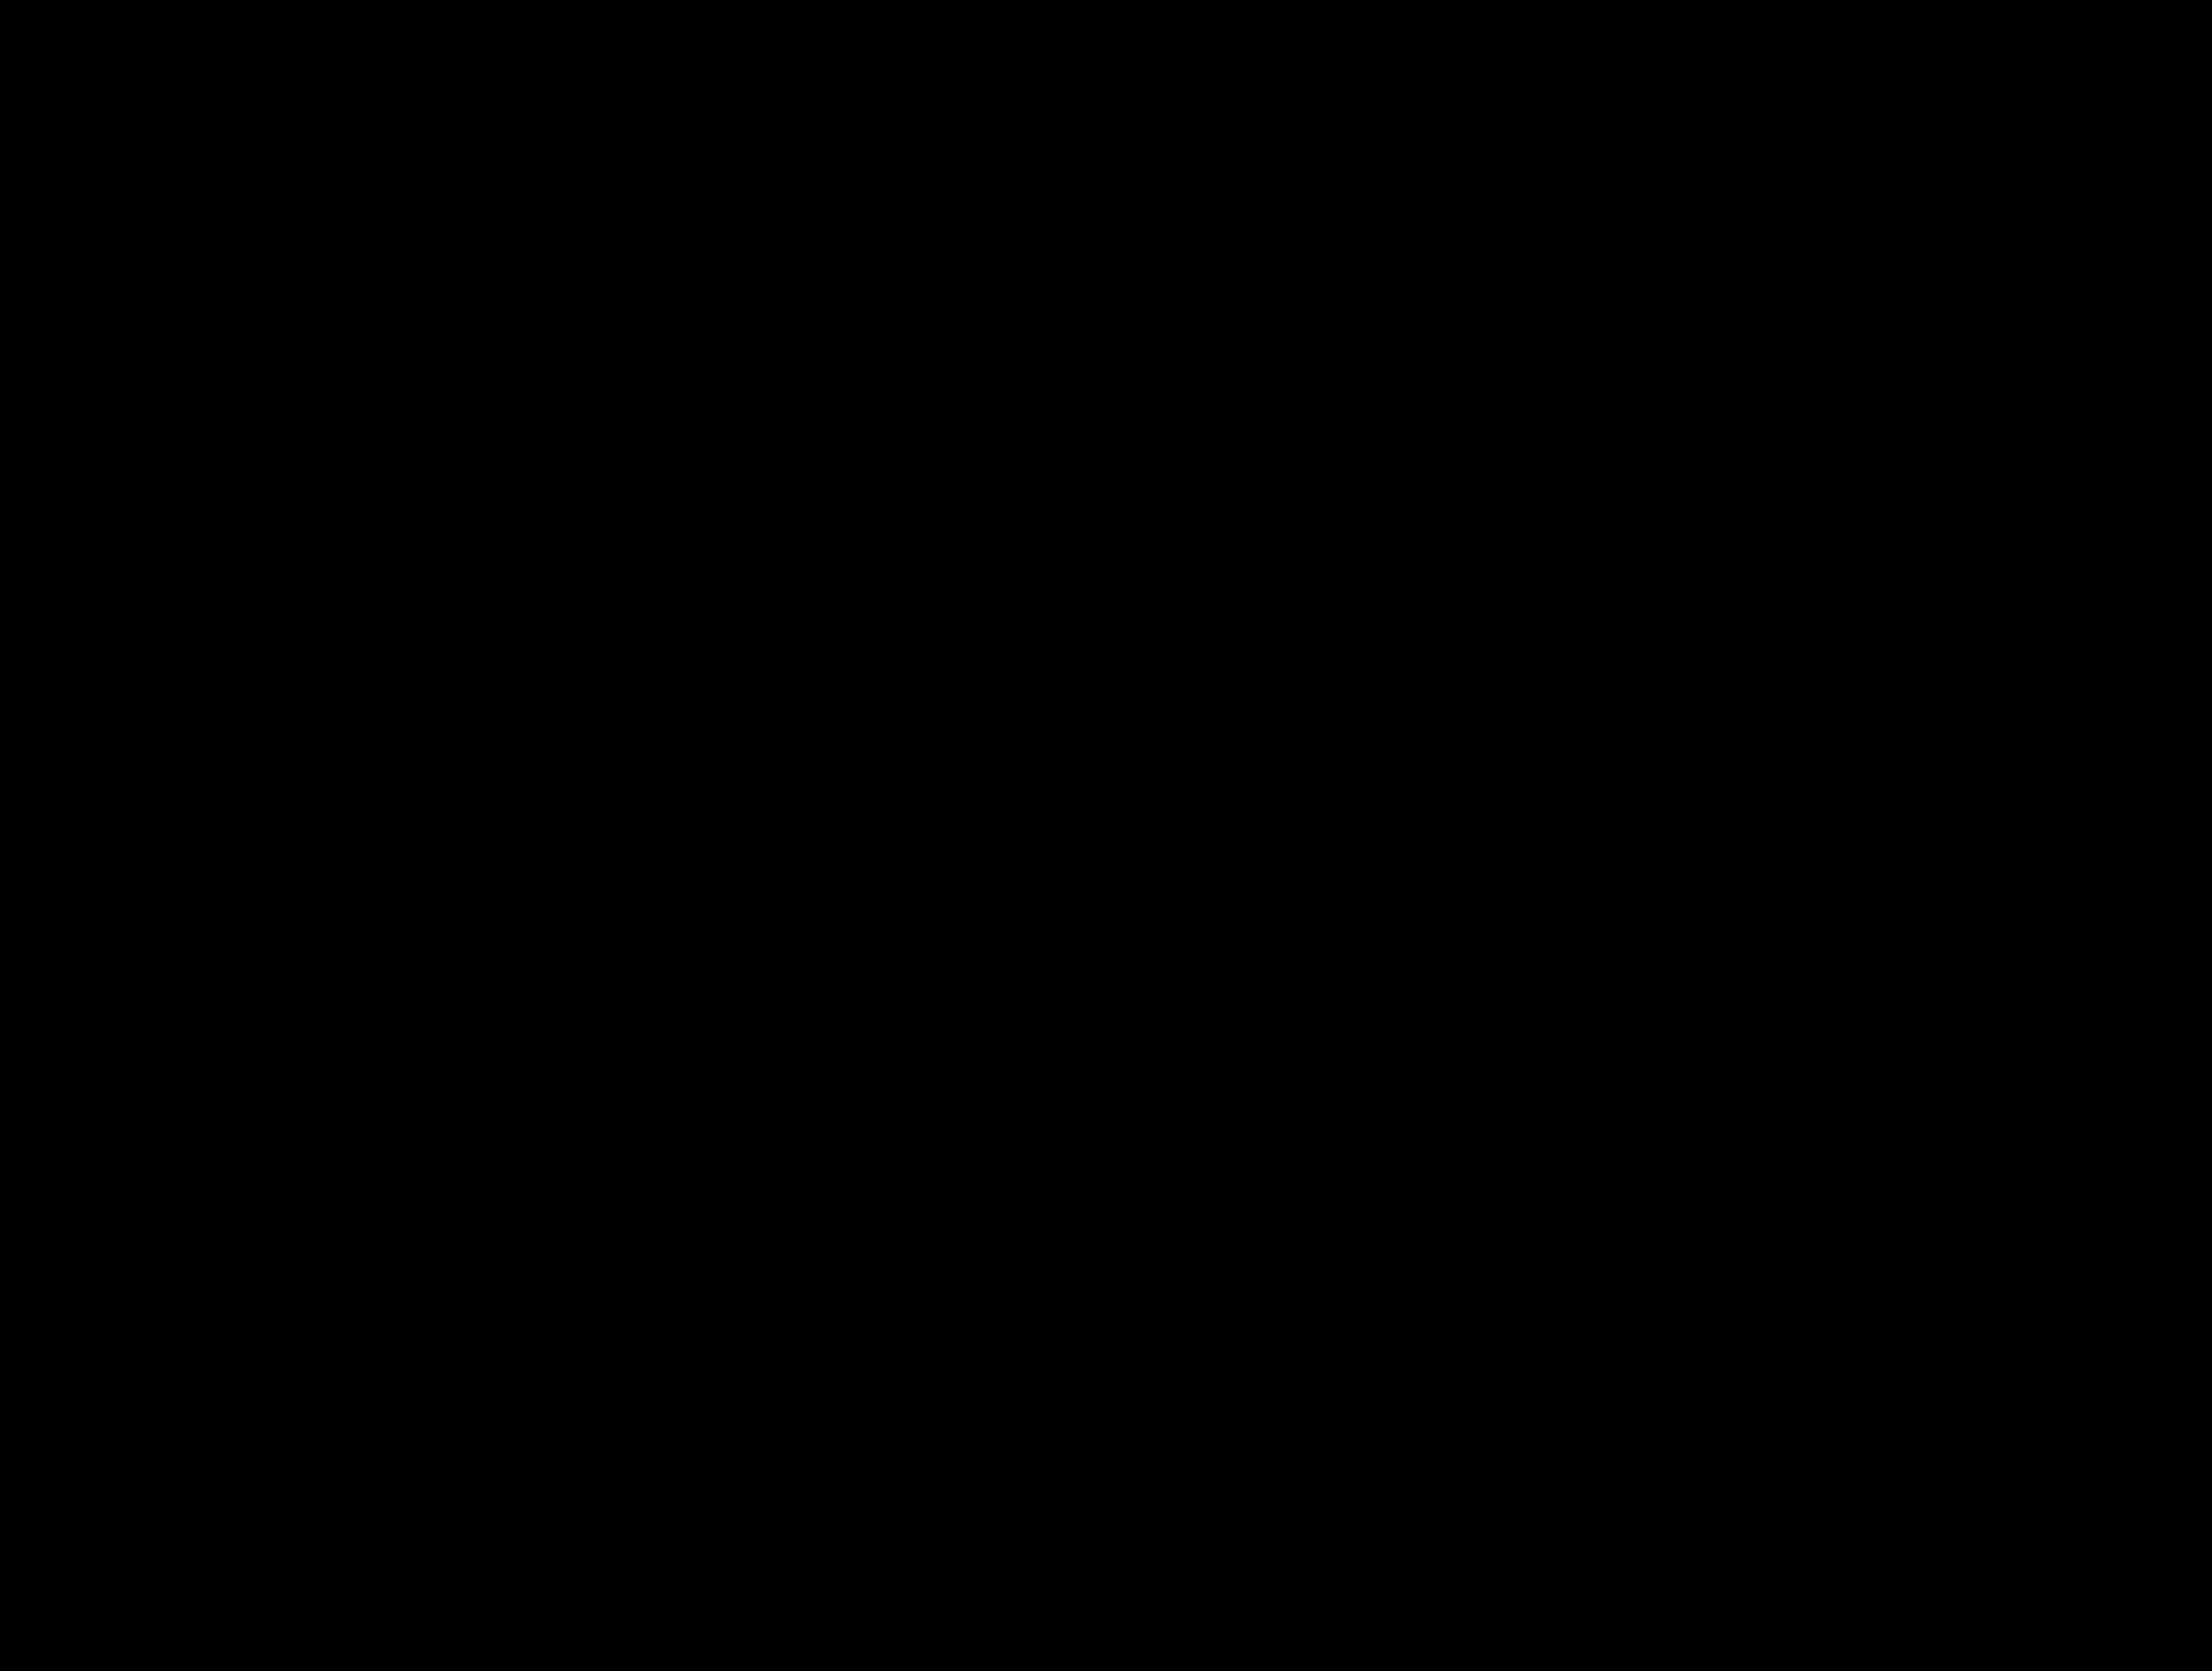 2400x1813 Clipart